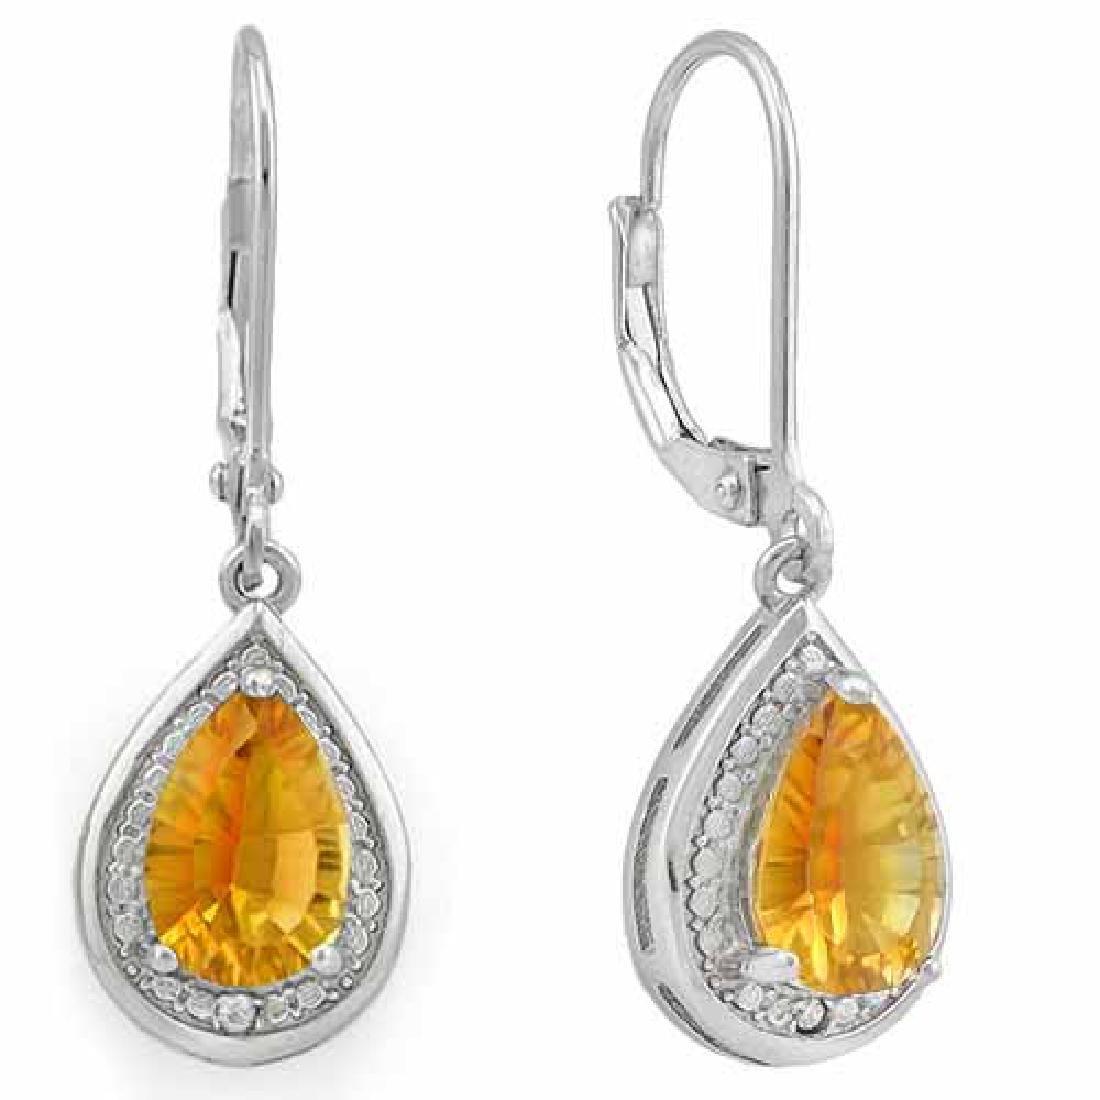 2 1/4 CARAT DARK CITRINE & DIAMOND 925 STERLING SILVER